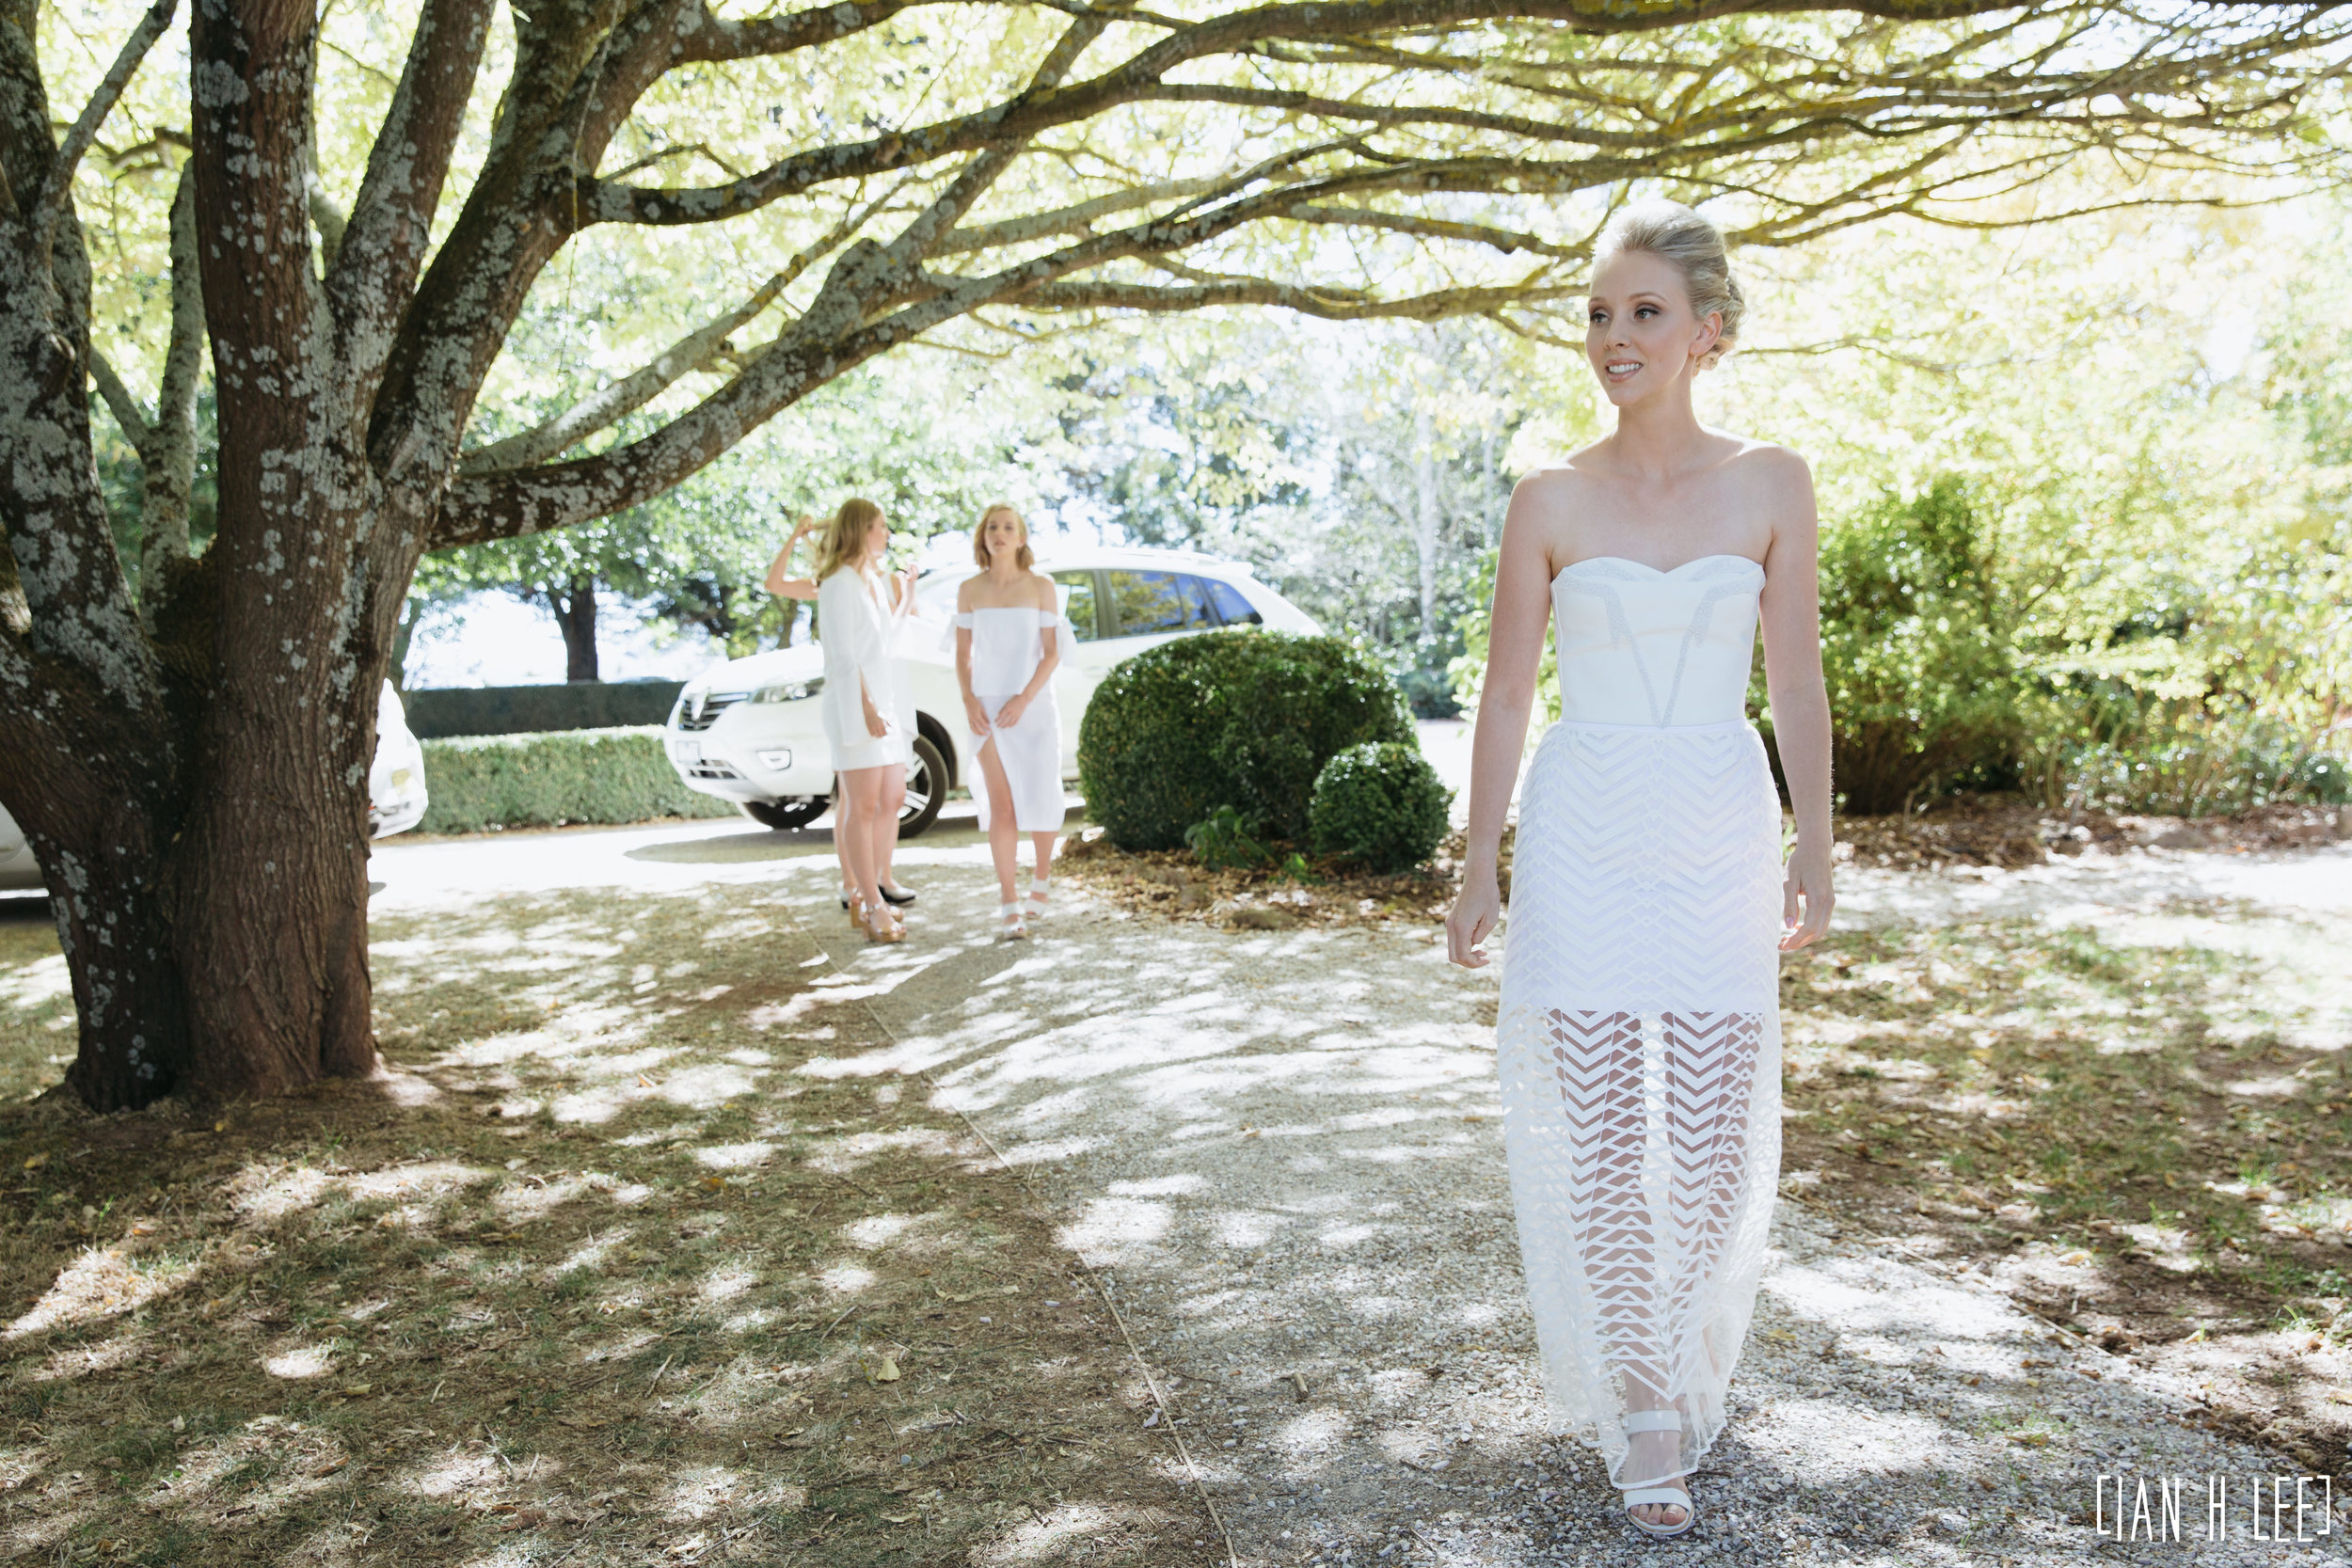 [Ian H Lee] Photography || Weddings - Melbourne || Ewan And Courtney -9348.jpg